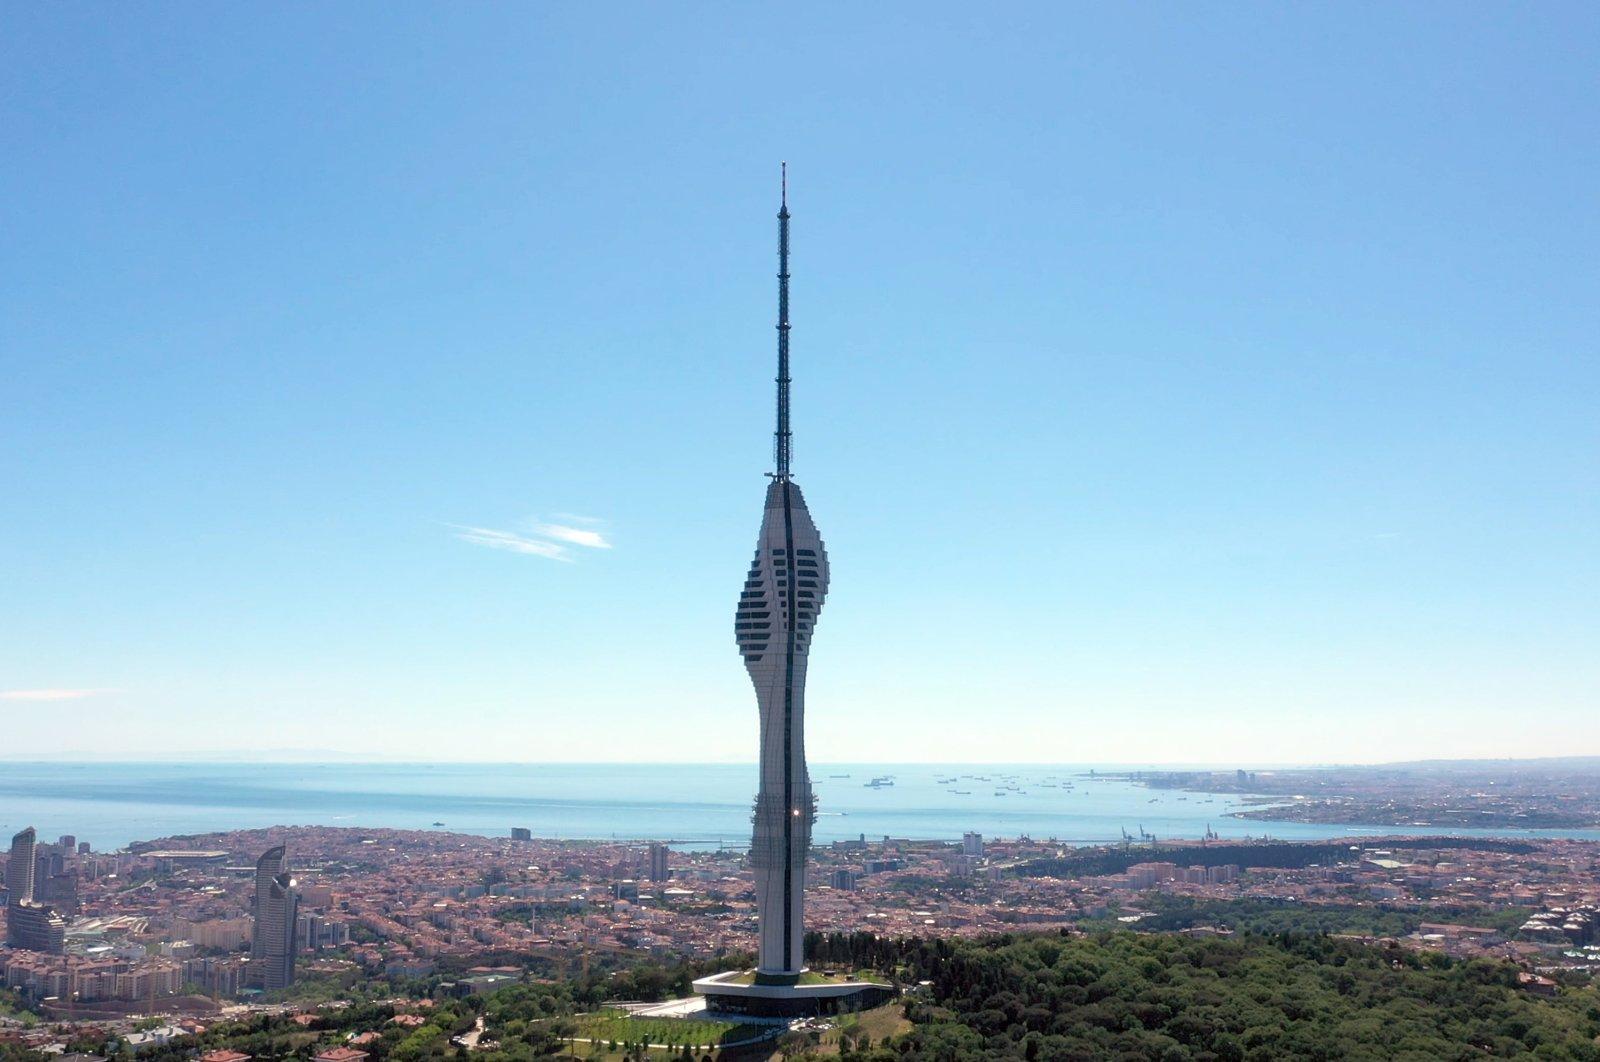 The Çamlıca Tower extends to the sky, in Üsküdar district, Istanbul, Turkey, May 29, 2021. (AA Photo)